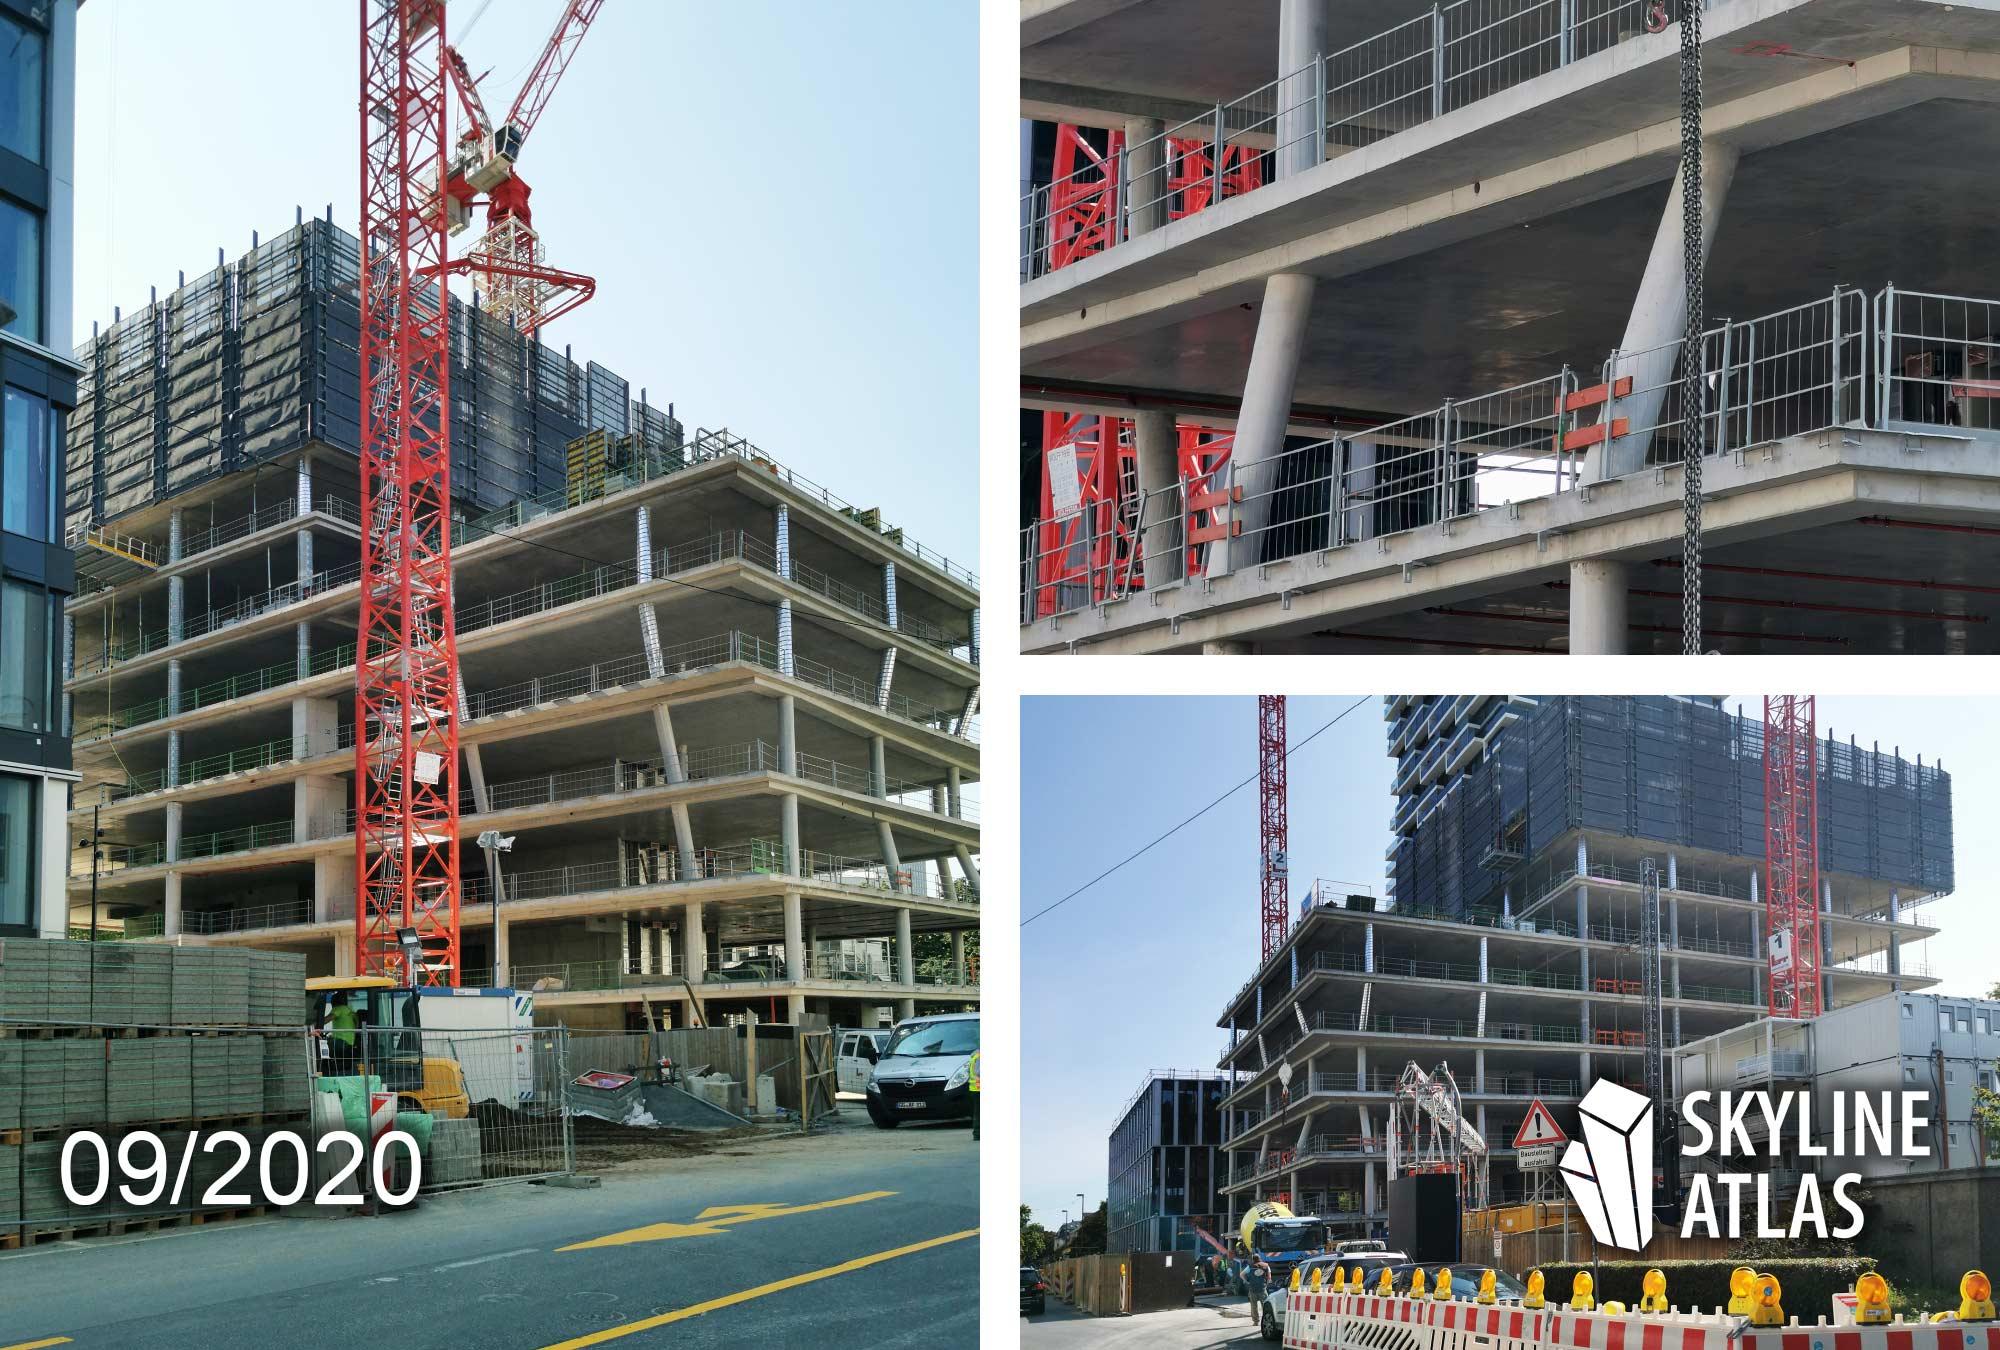 99 West Frankfurt - Ninty Nine West - Hochhausbaustelle - Baufortschritt - Betonarbeiten - September 2020